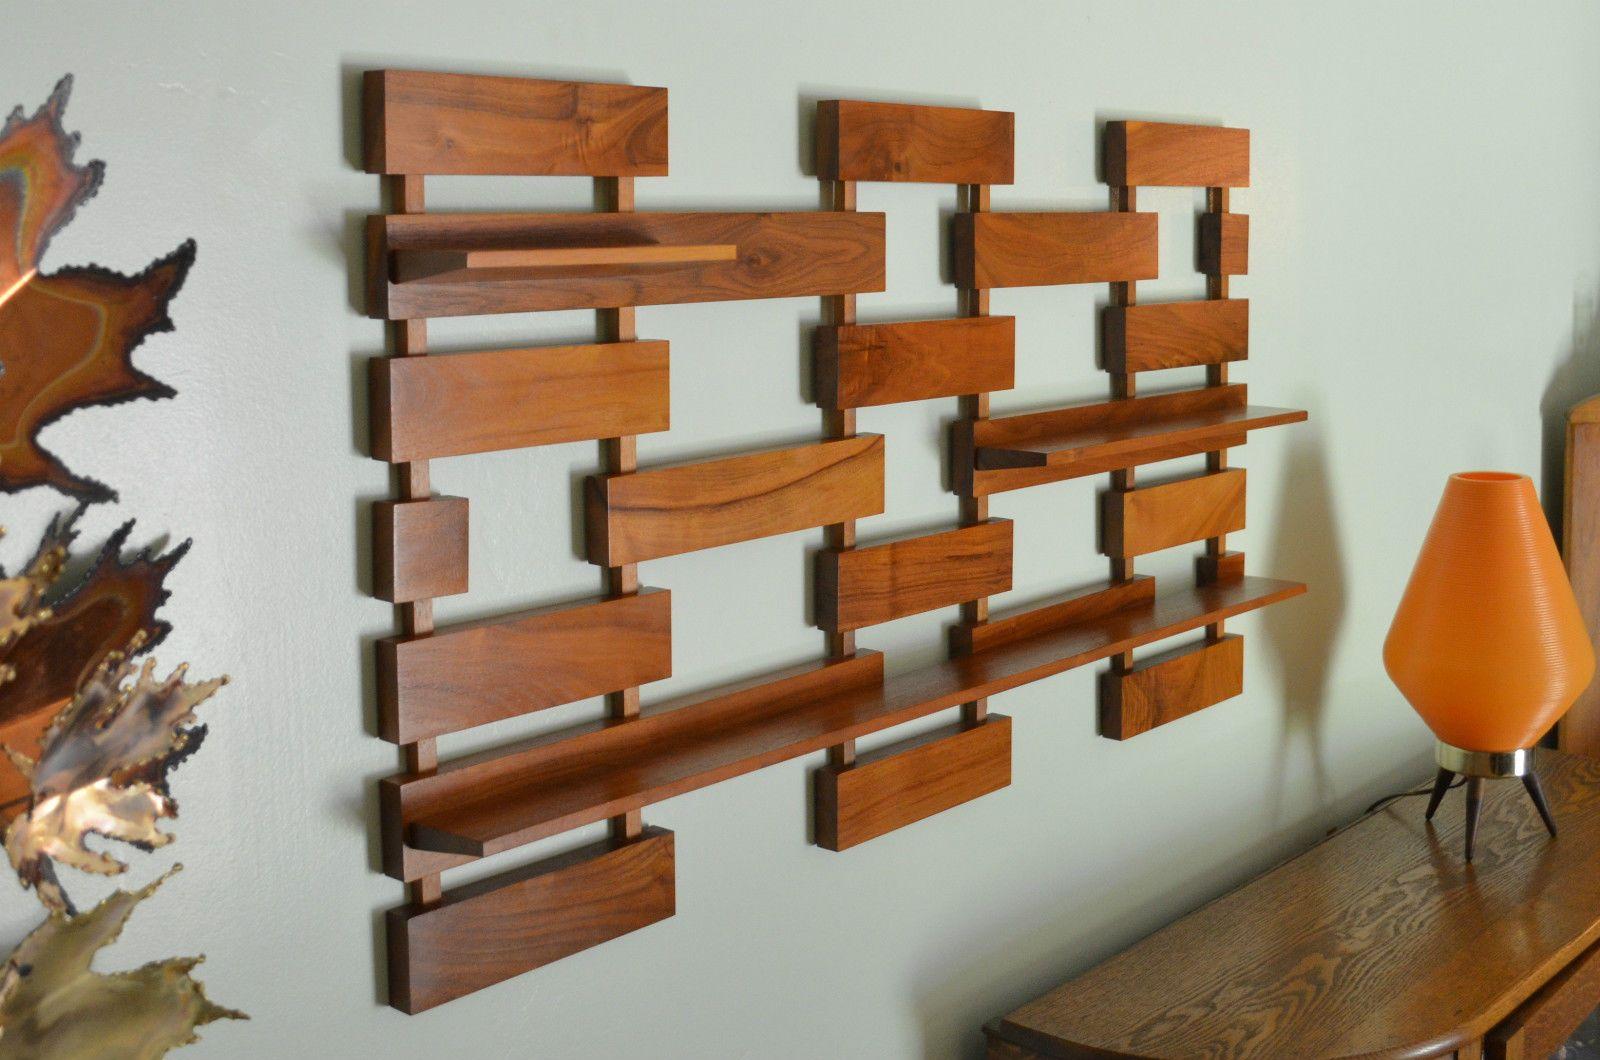 Vintage Belart Co Wall Shelf Teak Wood Mid Century Modern Wood Wall Art Decor Teak Wall Art Mid Century Modern Decor